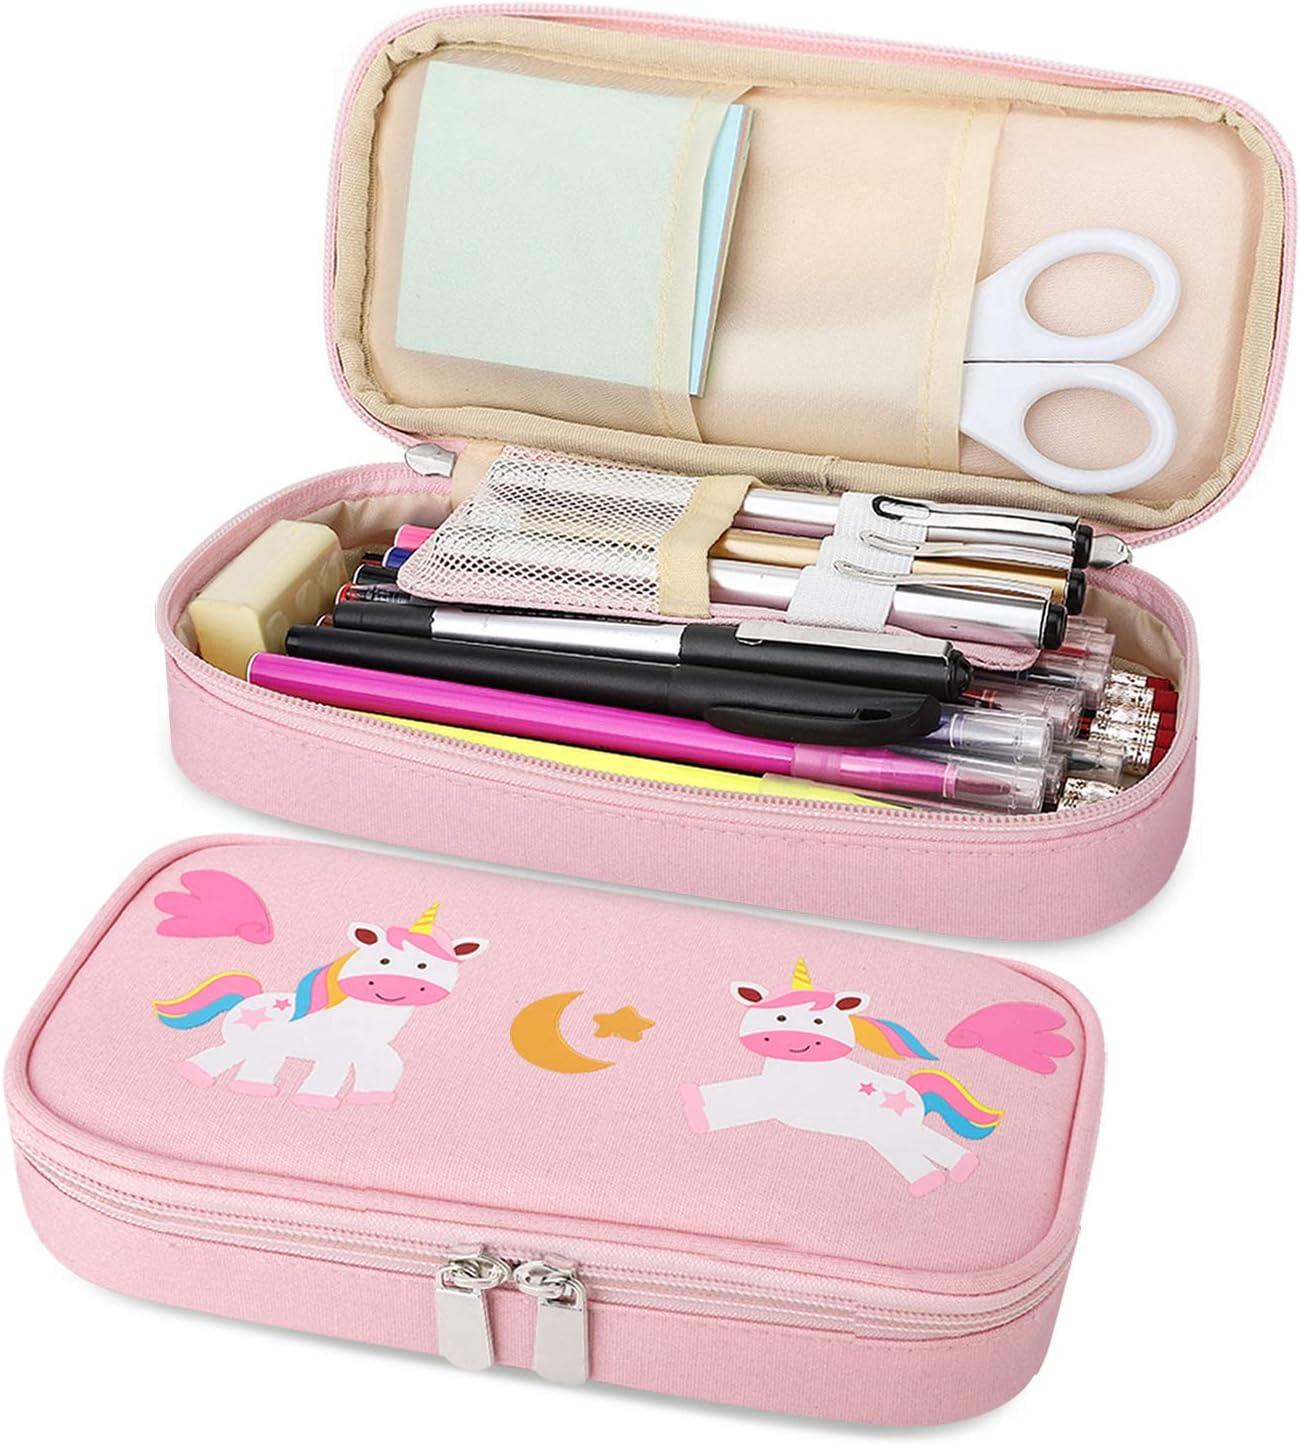 MoKo Pen Pencil Case Big NEW Tulsa Mall Stationery Prin Capacity Cute Students